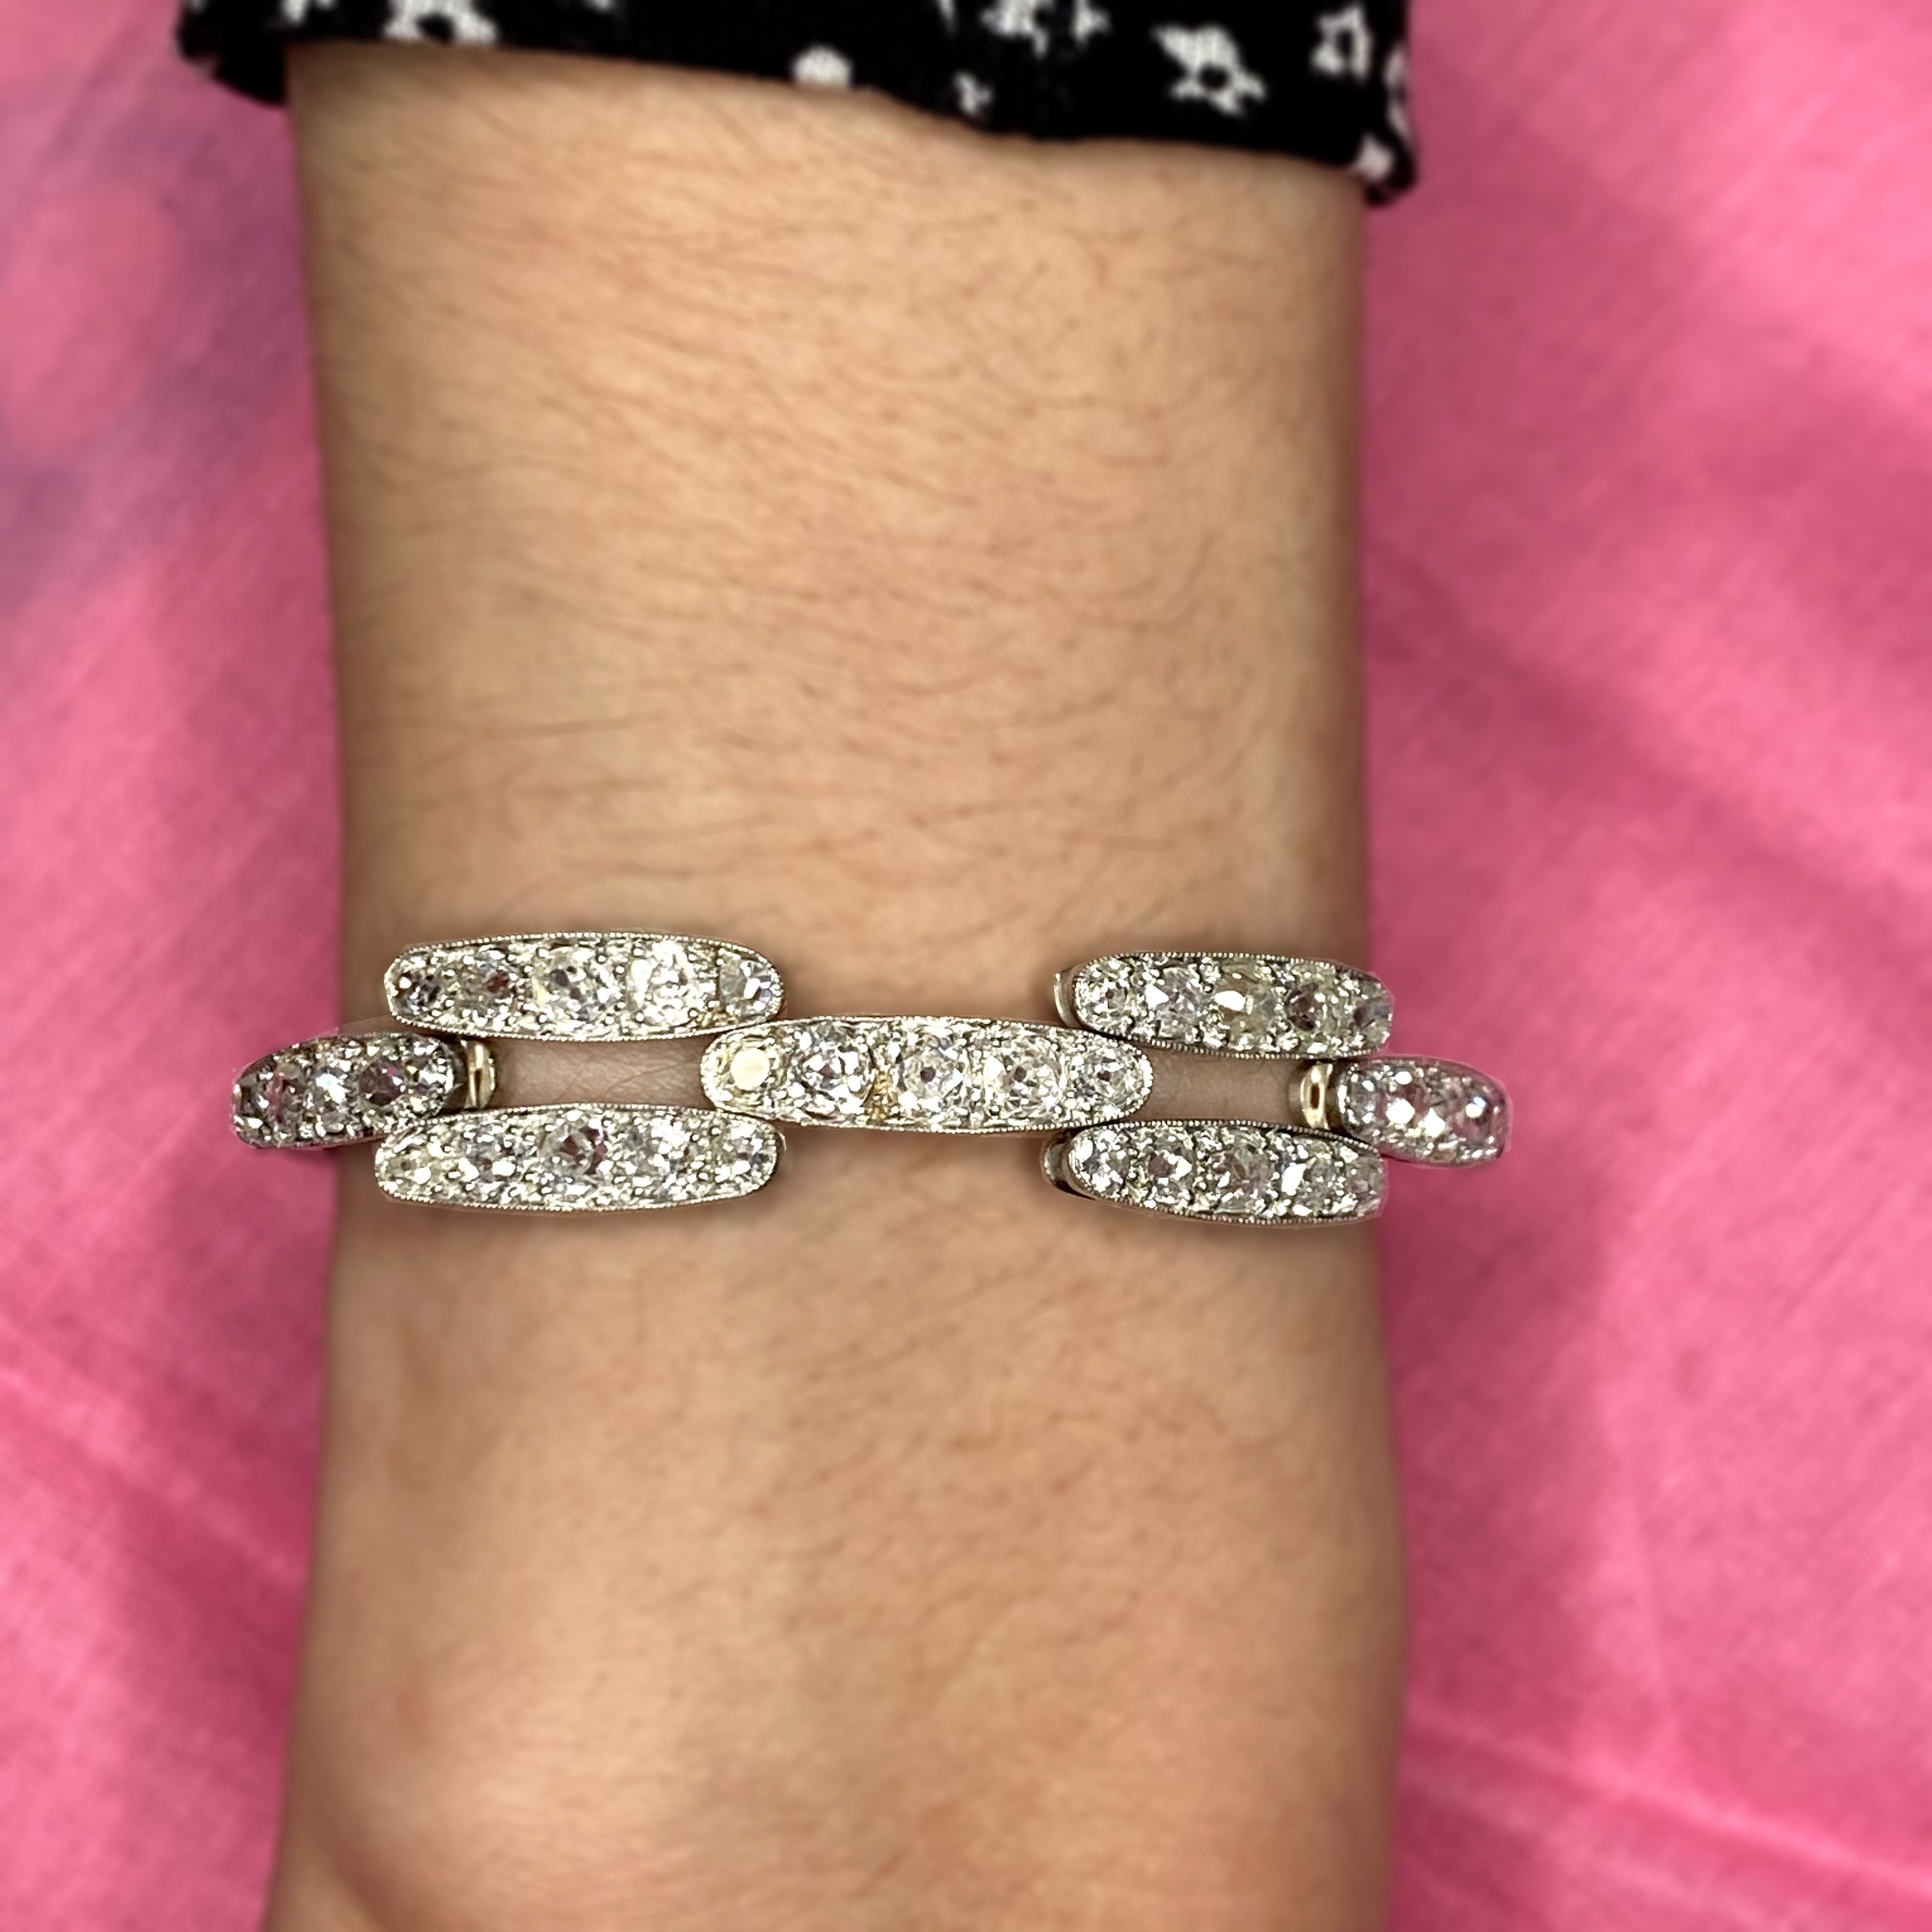 Jewellery - Image 4 of 4